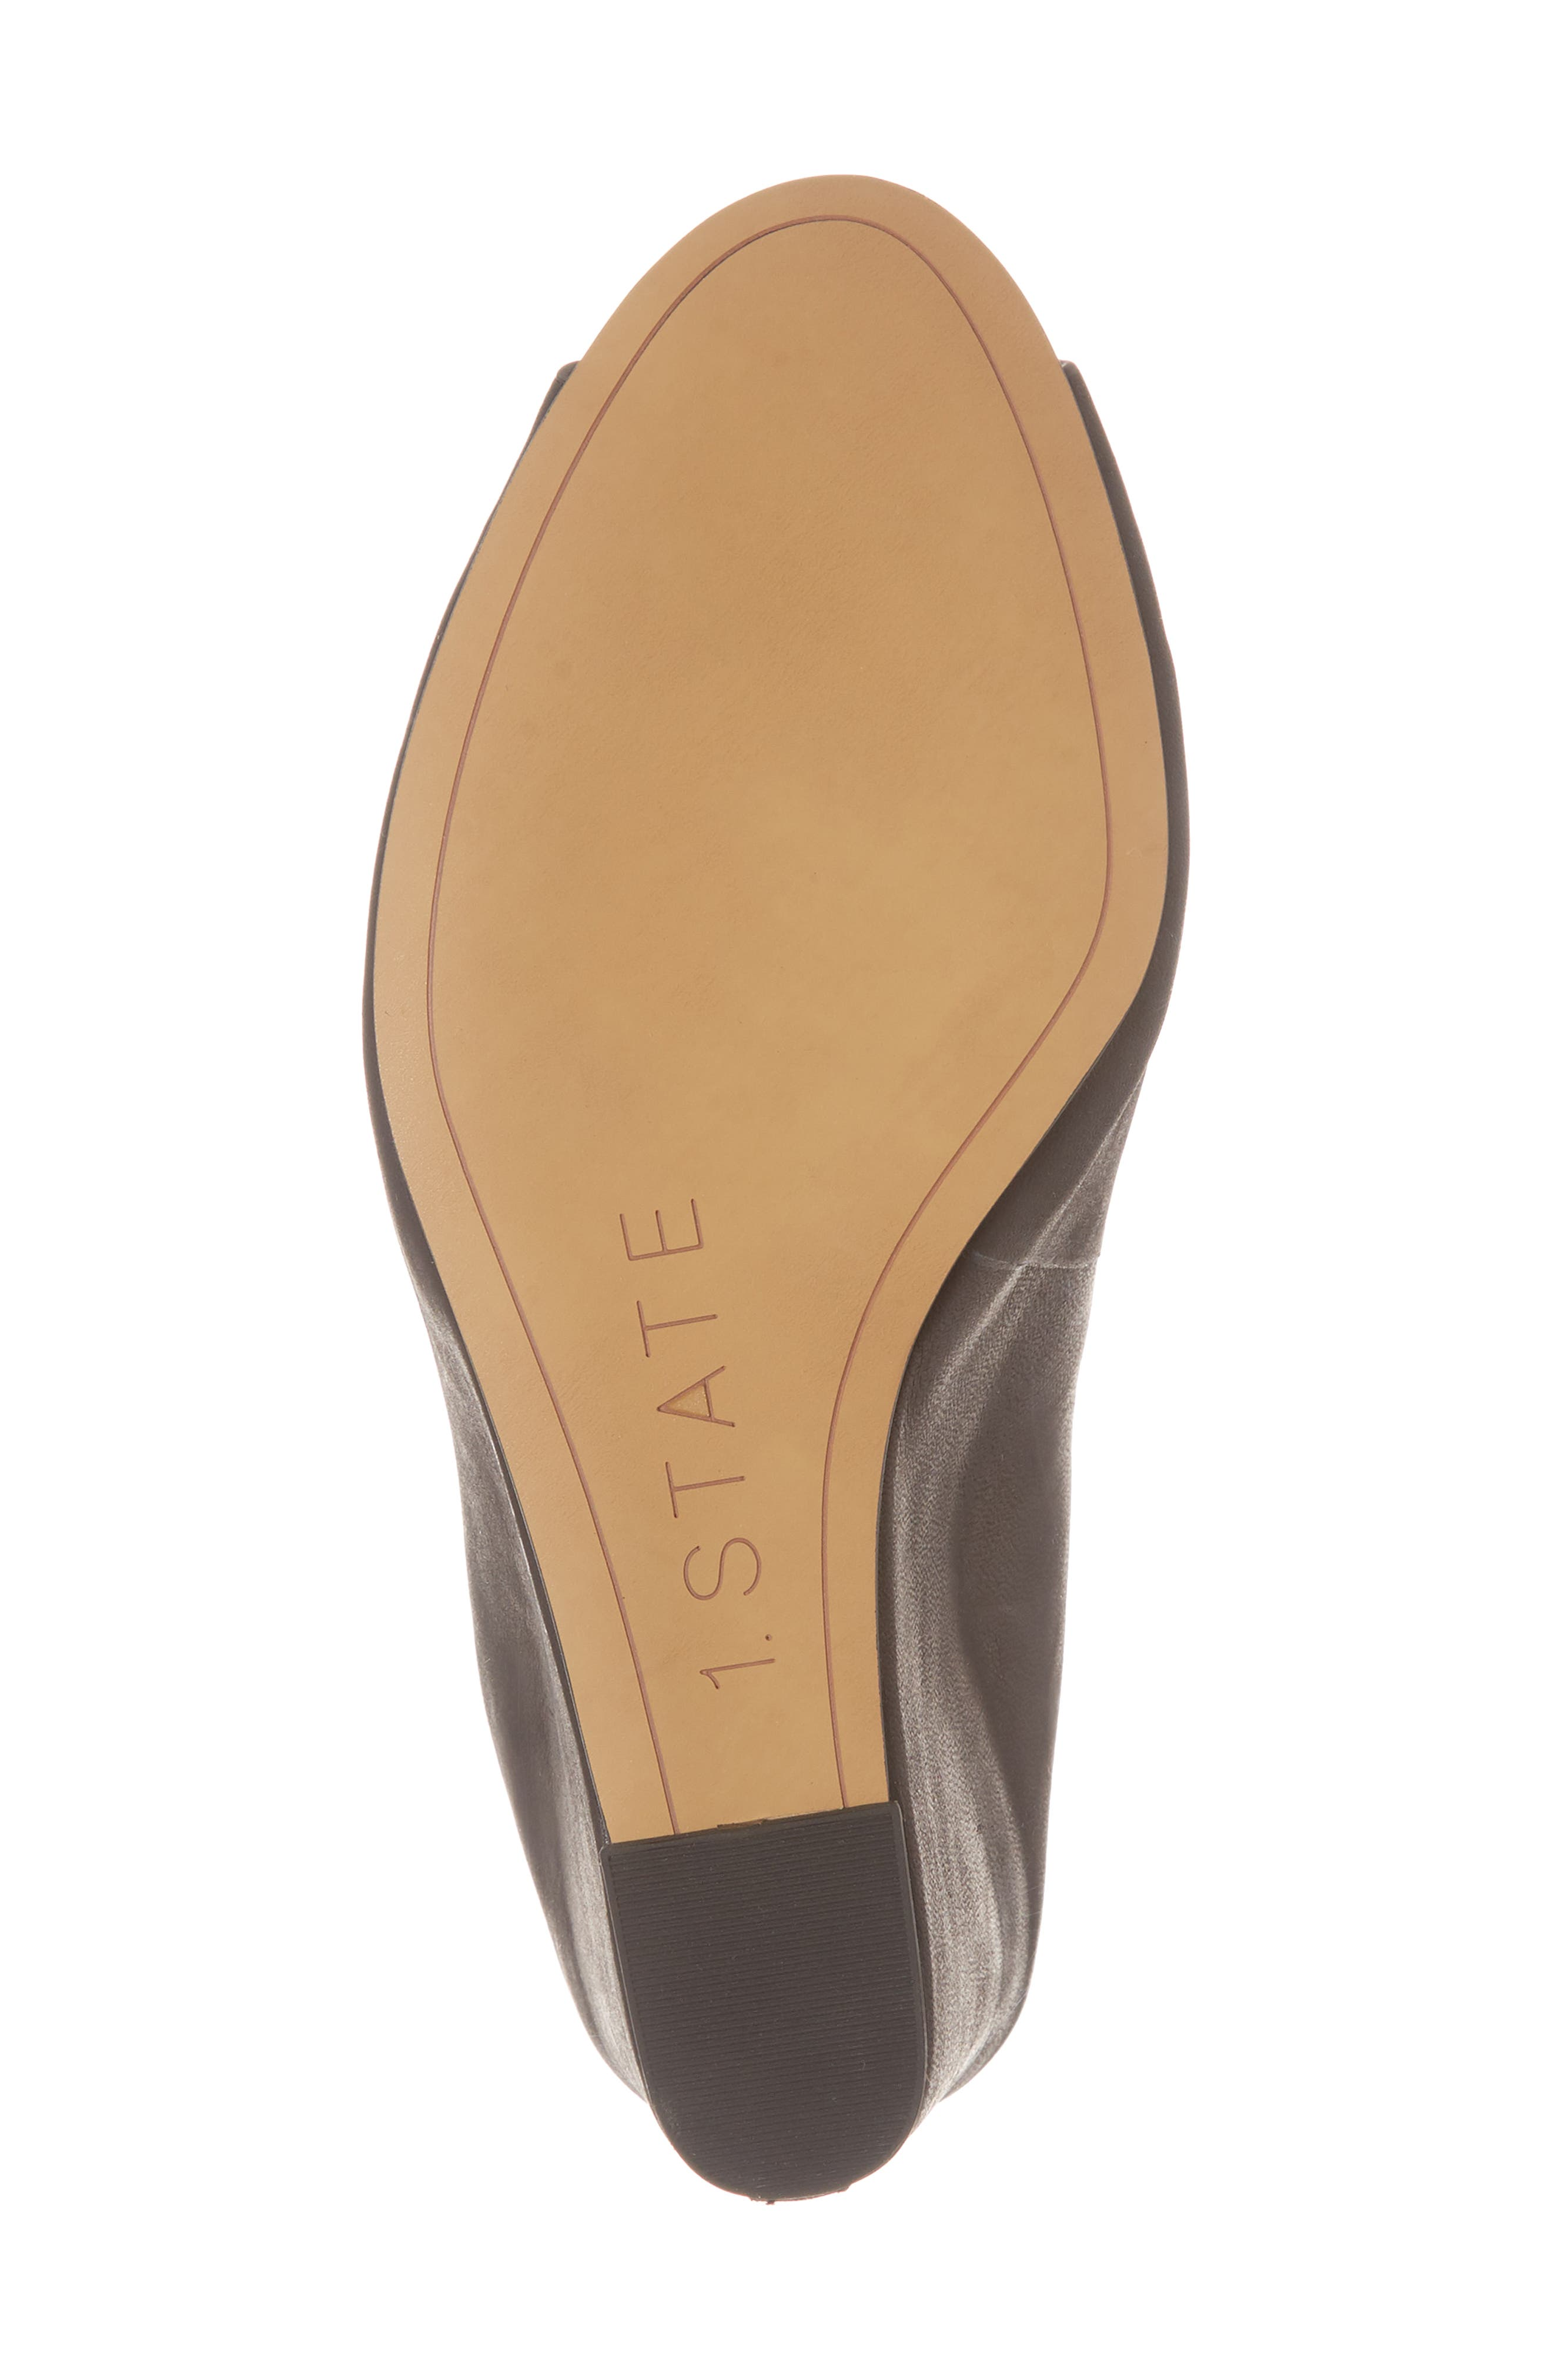 Felidia Wedge Sandal,                             Alternate thumbnail 6, color,                             001